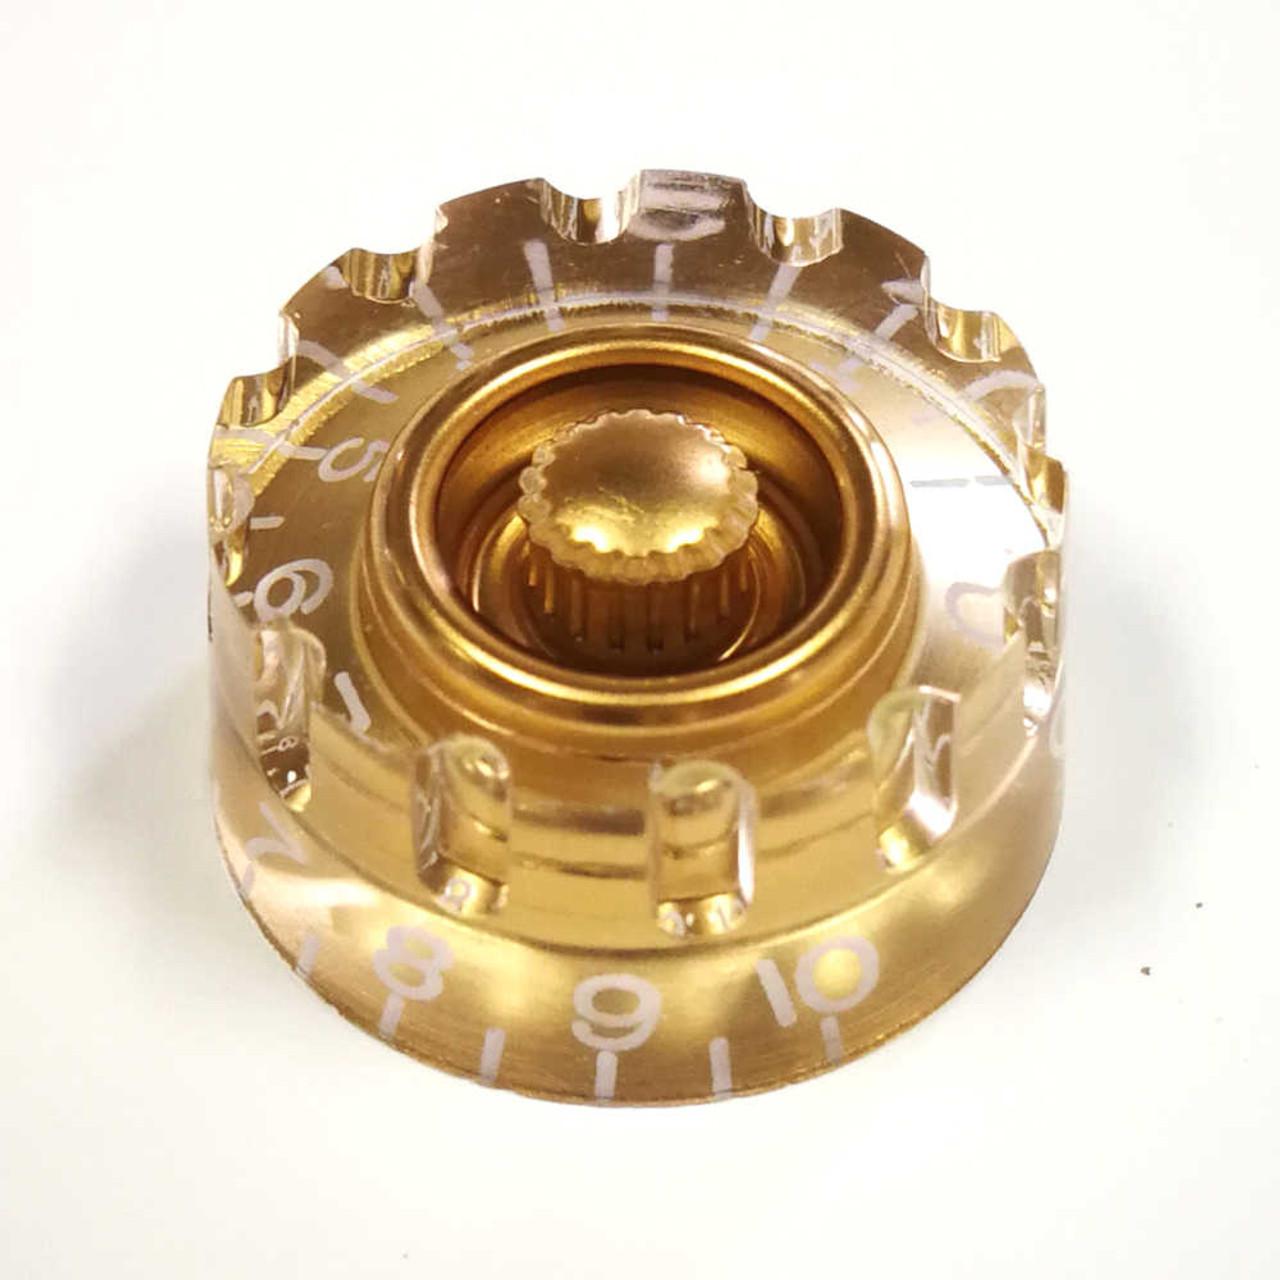 Knurled Speed Knob - 18-spline Gold